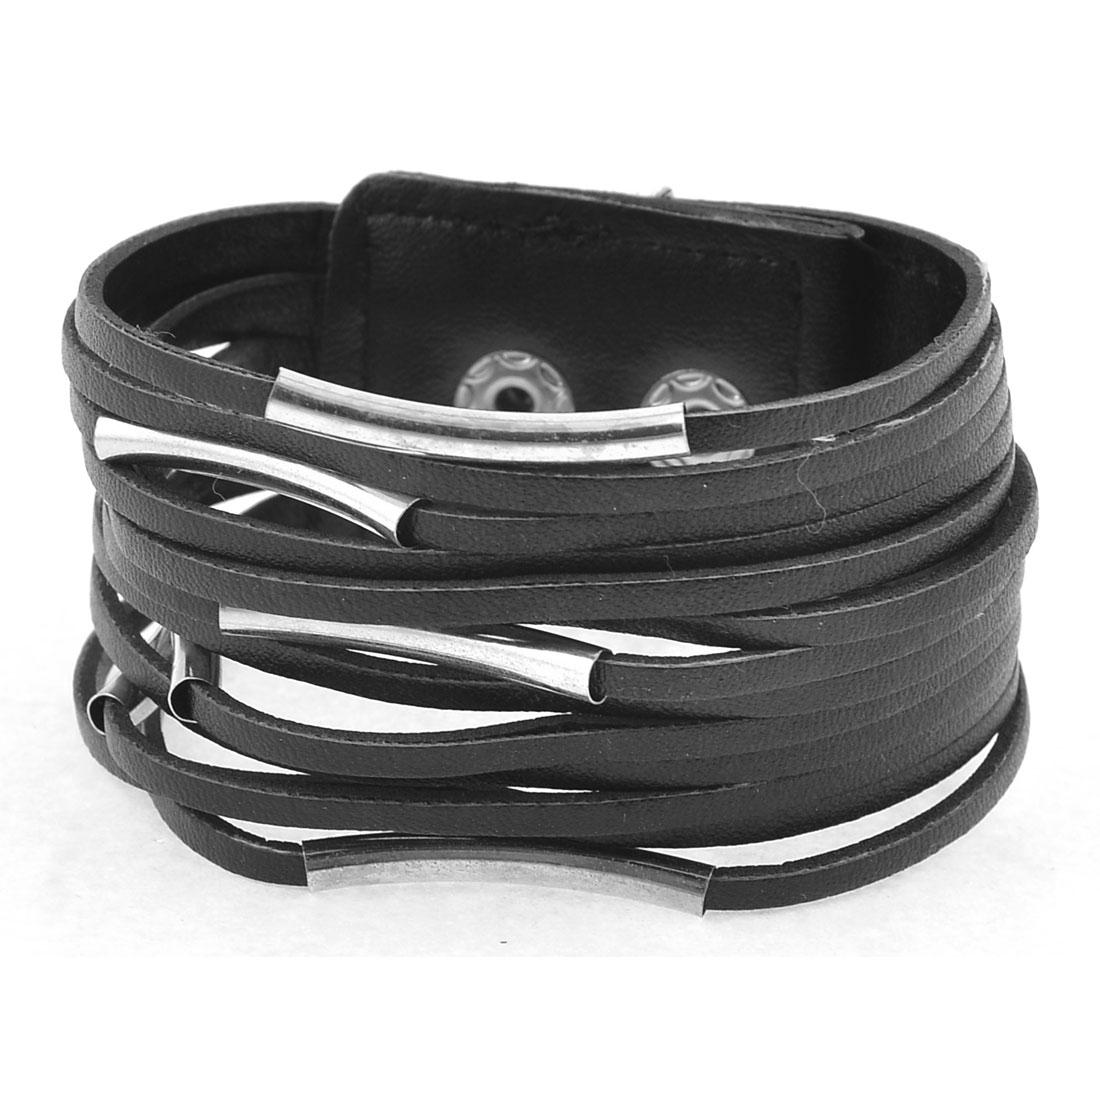 Metal Press Stud Button Black Faux Leather Adjustable Bracelet